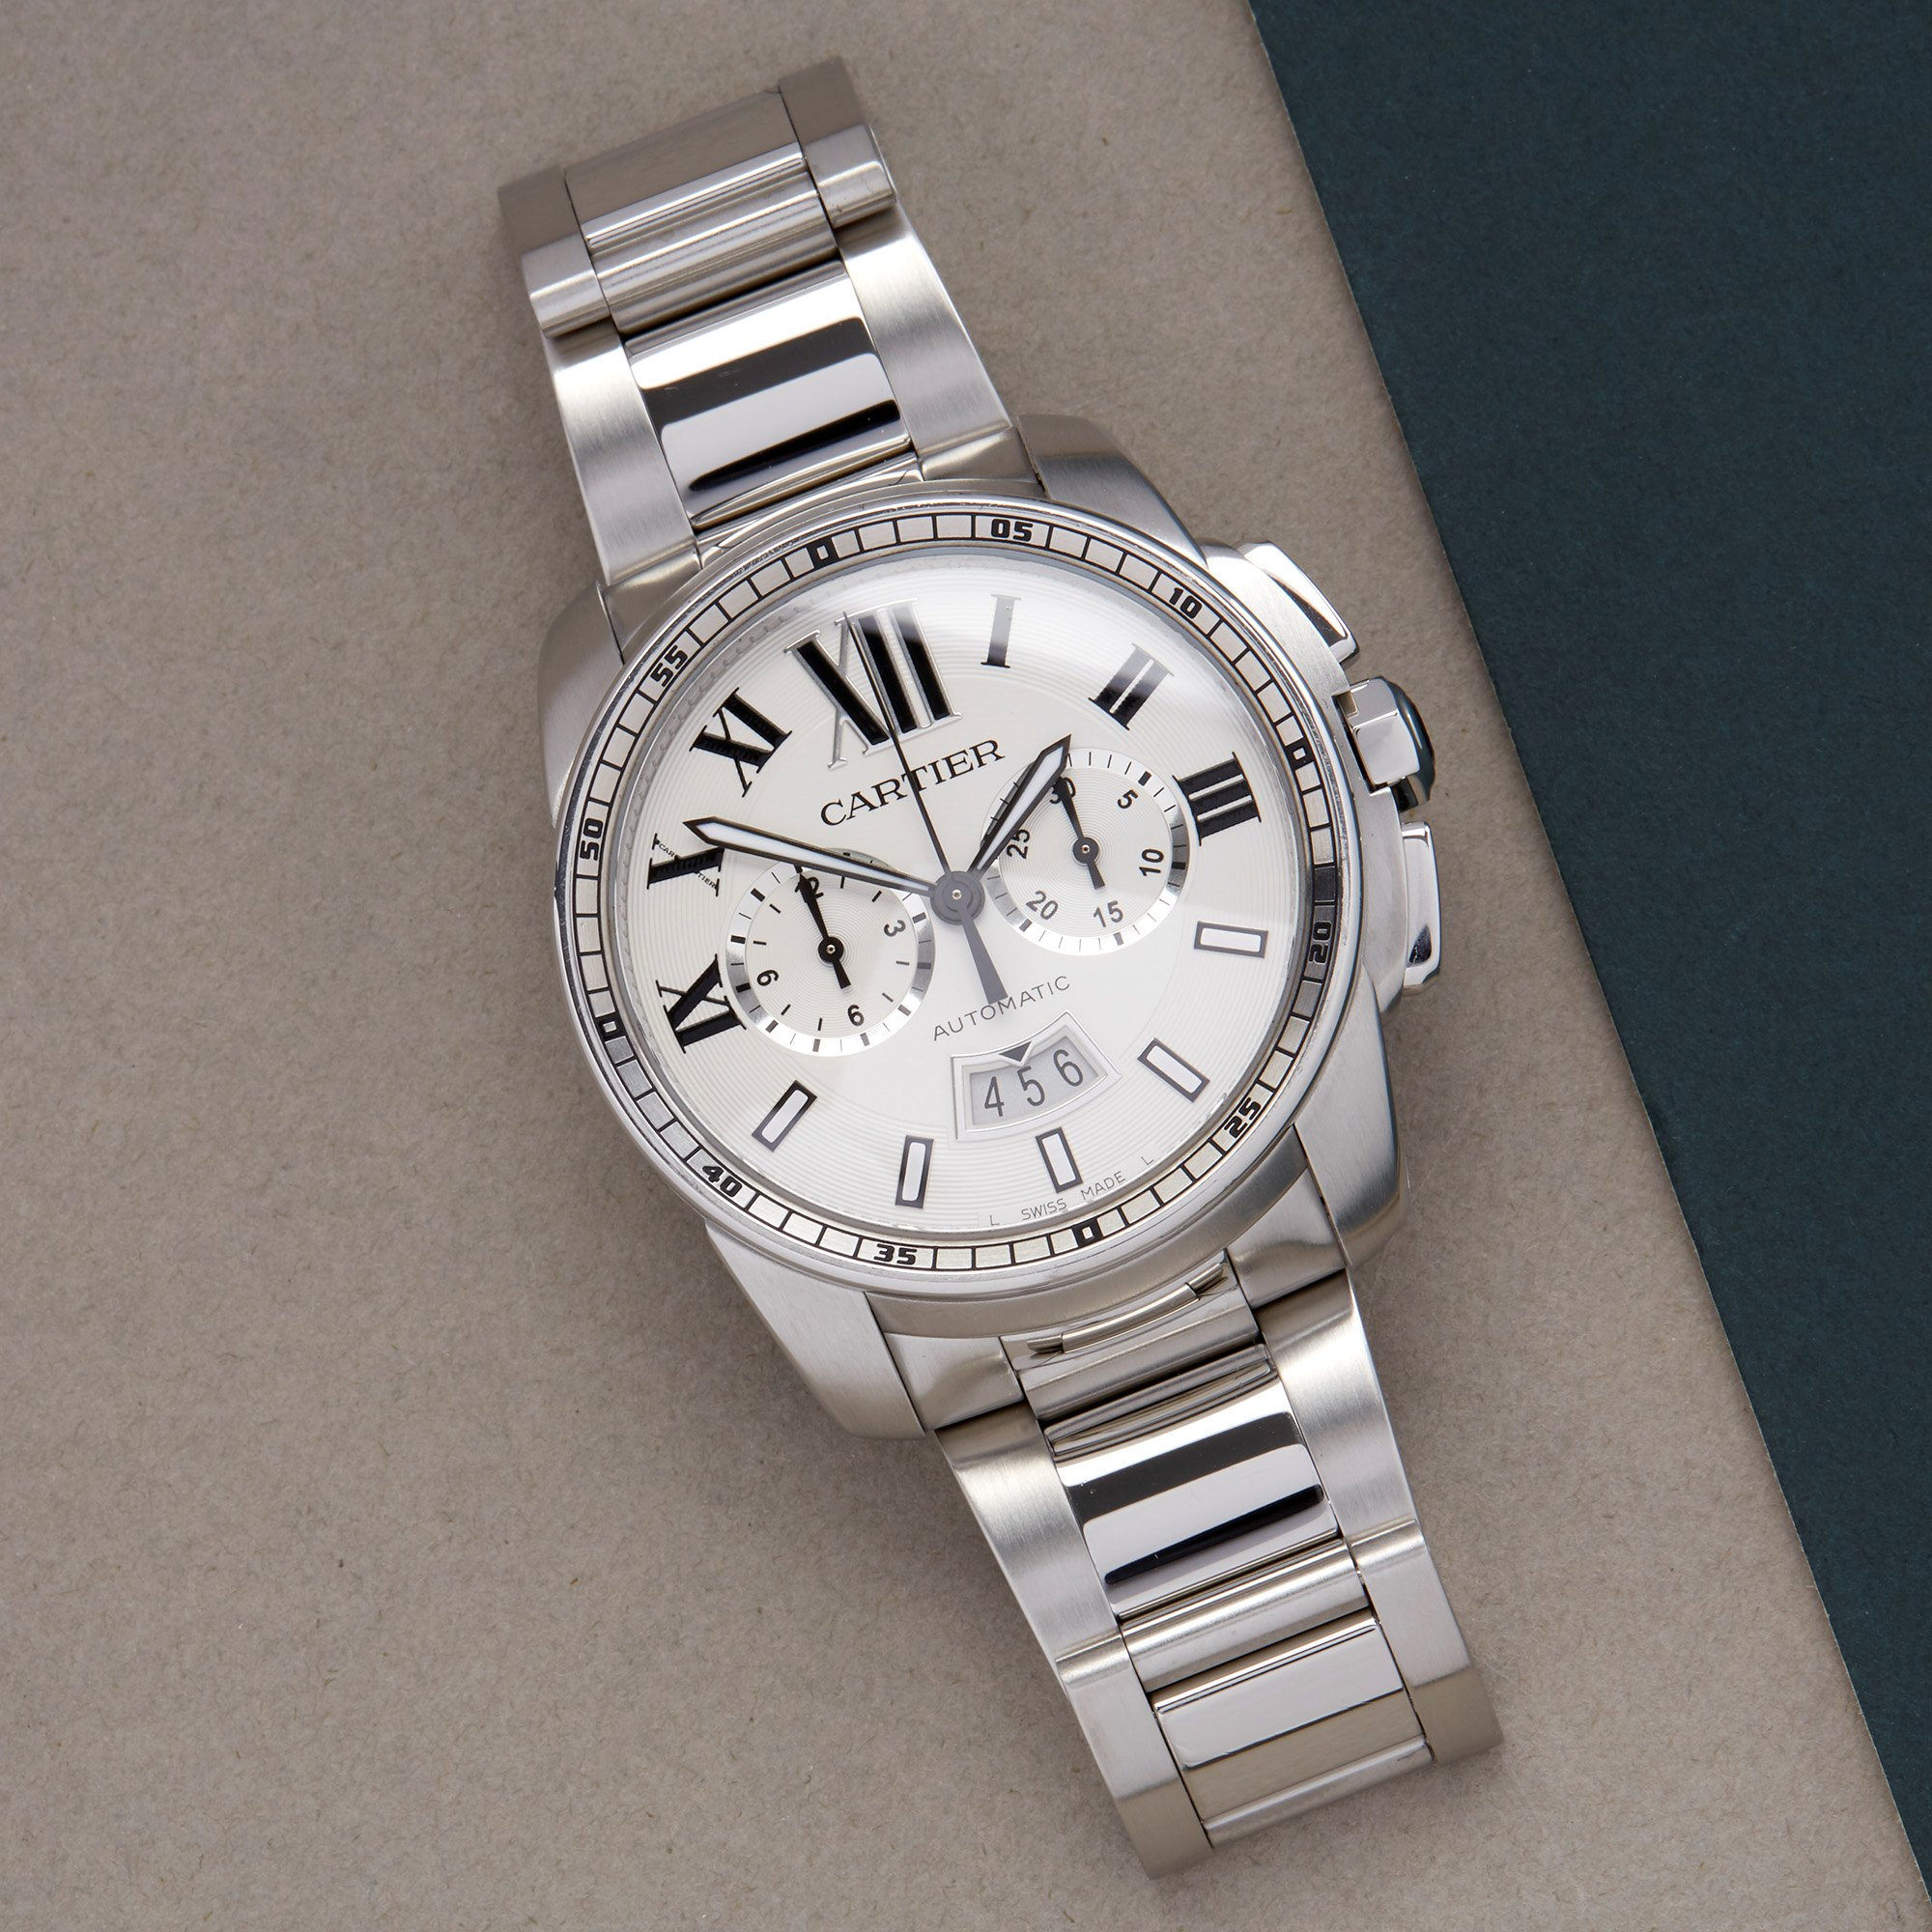 Cartier Calibre de Cartier Chronograph Stainless Steel W7100045 or 3578